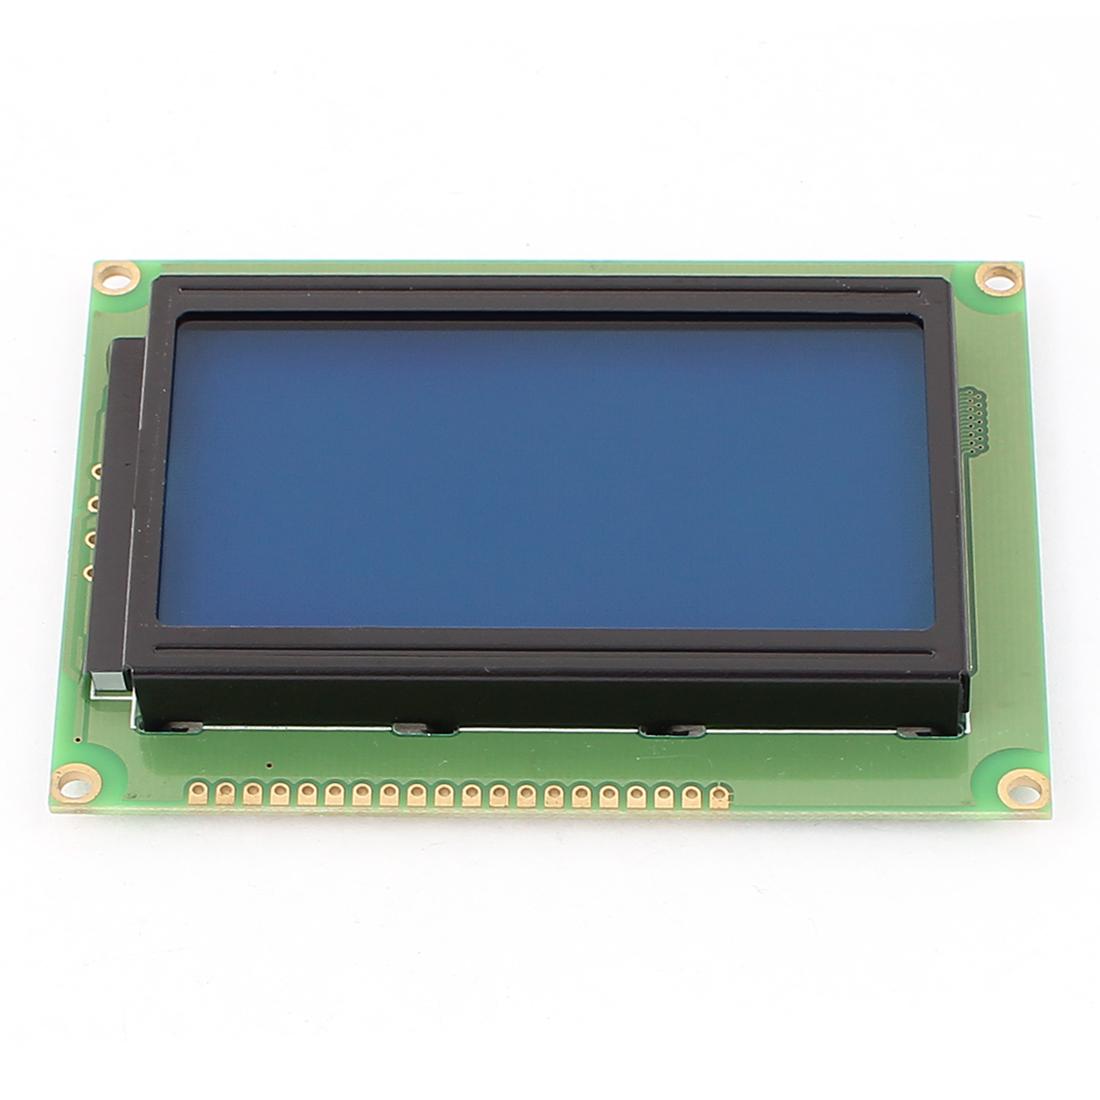 "LCD12864 Display Dot matrix 3.2"" LCD Screen DC 5V Module for MCU"